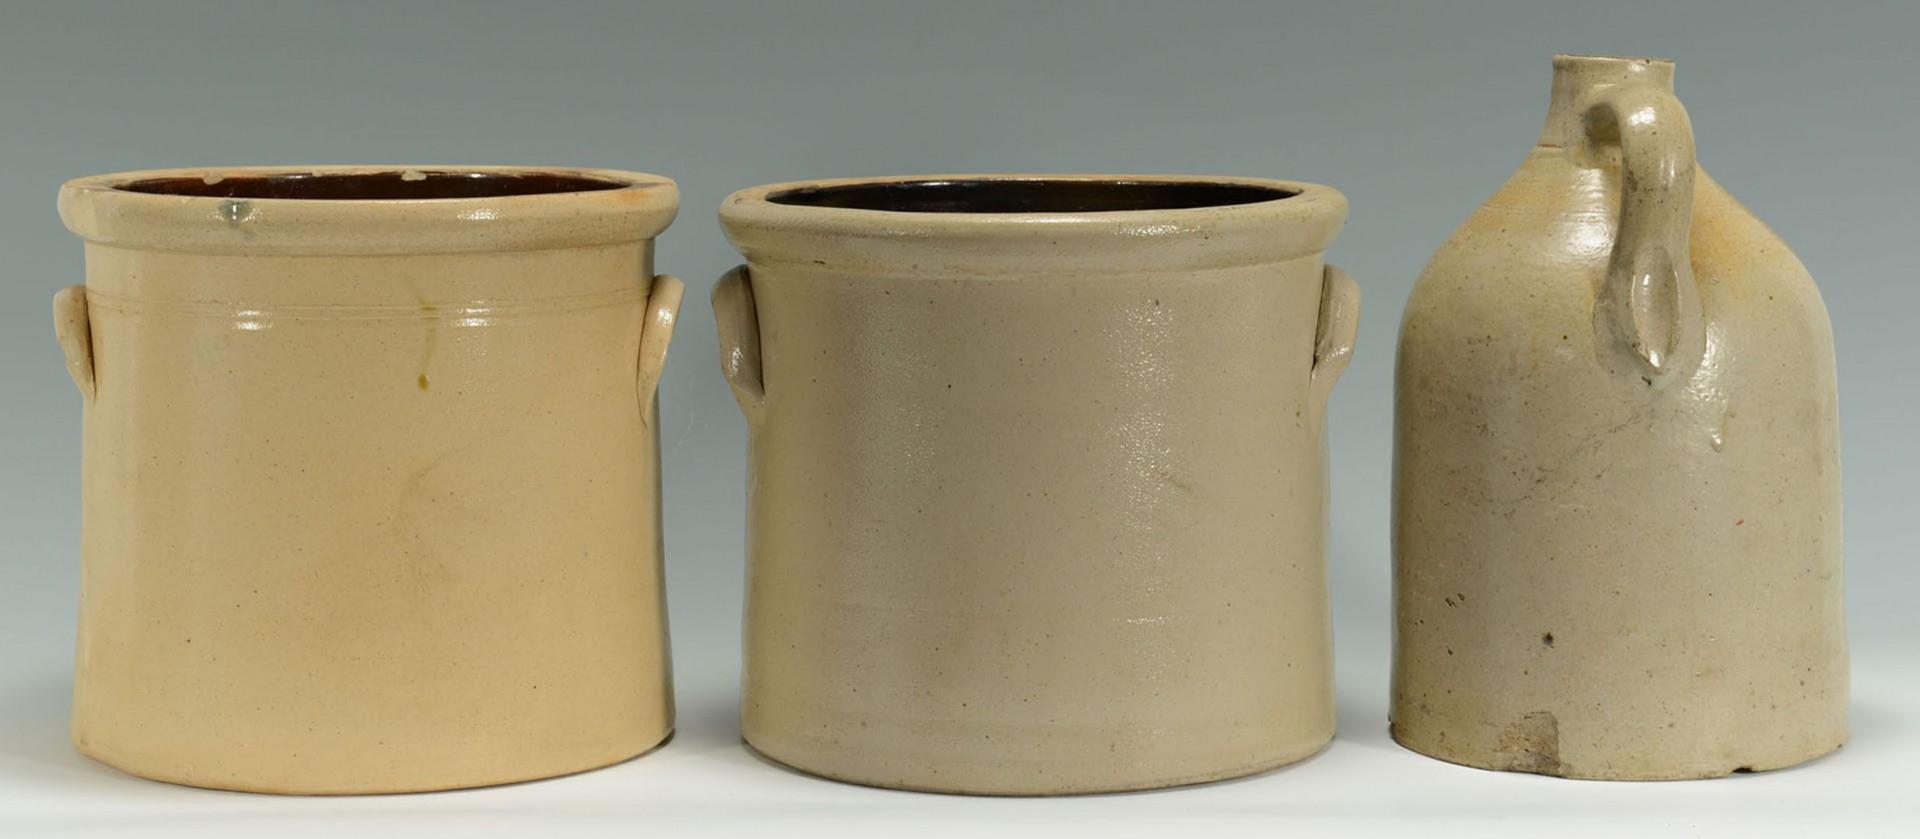 Lot 2872350: 2 Cobalt Dec. Stoneware Crocks & 1 Jug, New Englan